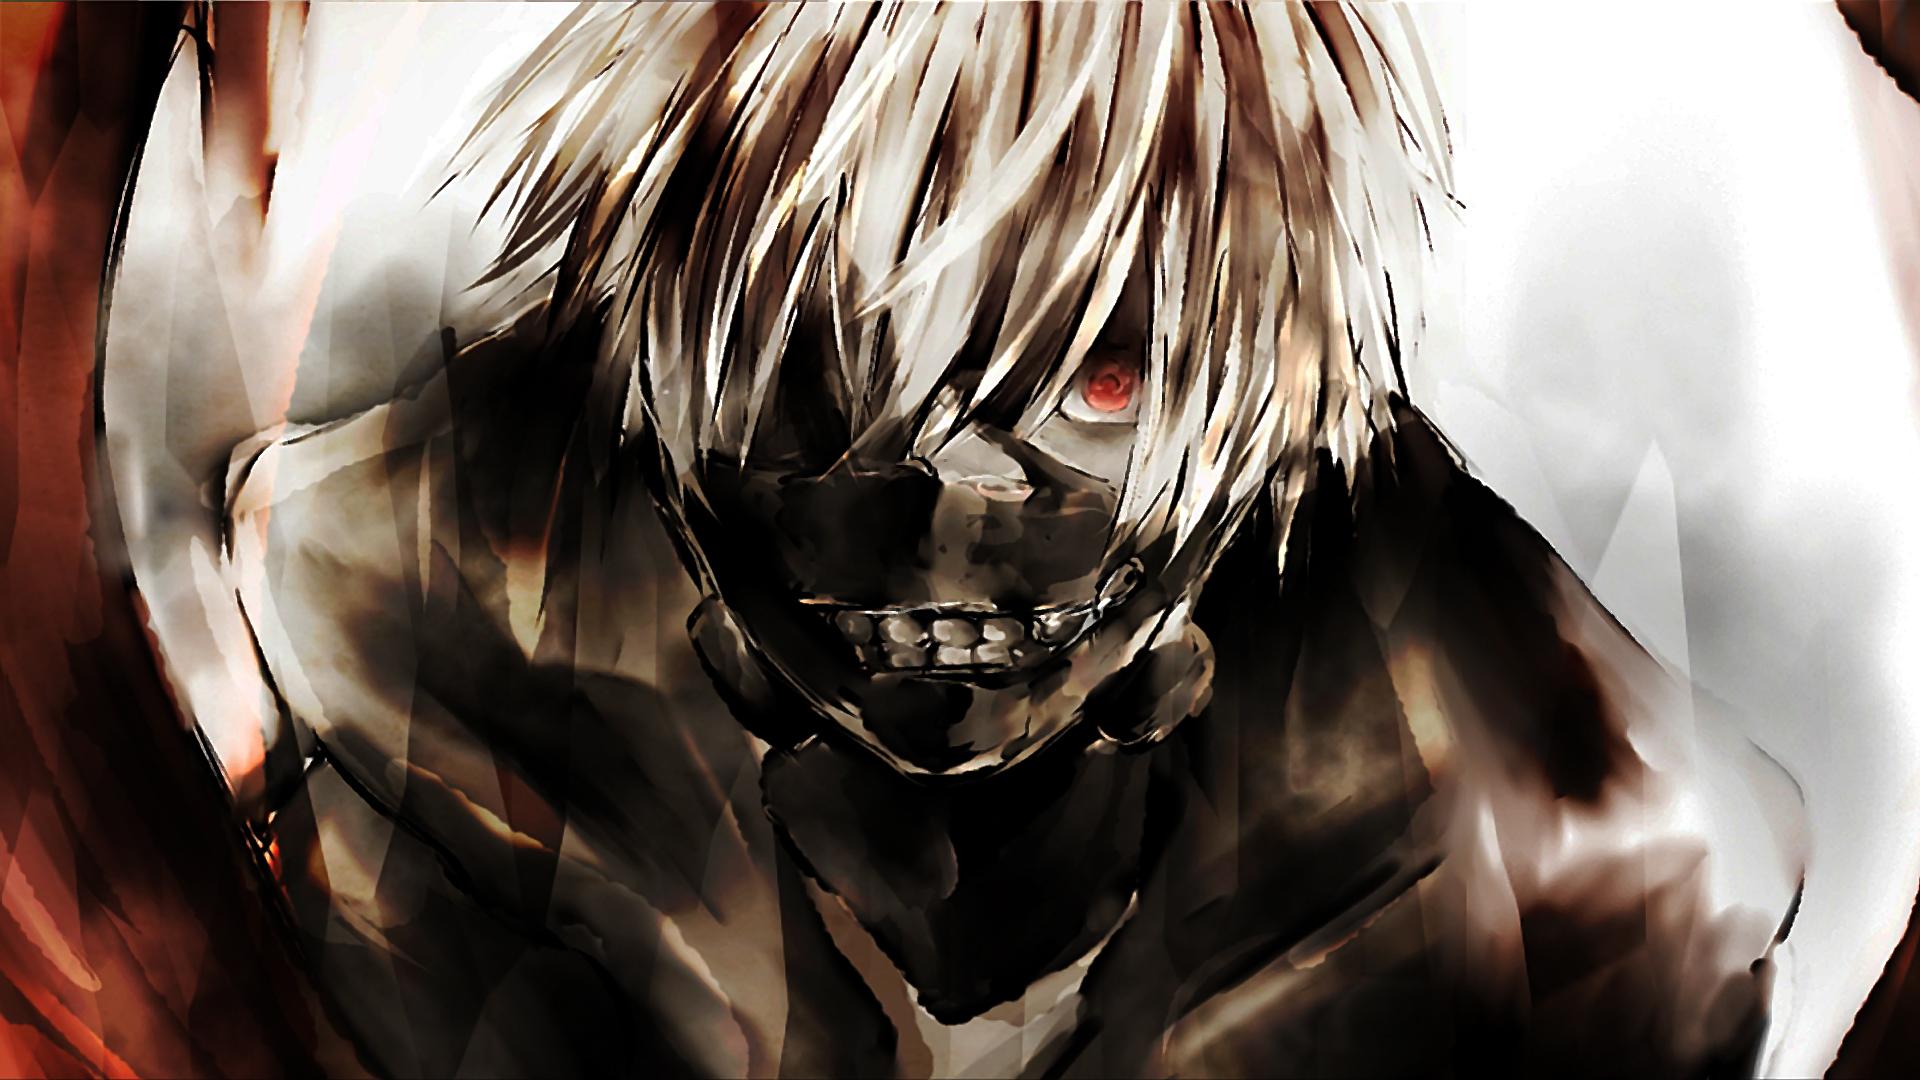 ken kaneki tokyo ghoul characters anime art mask hd 1920x1080 1080p 1920x1080